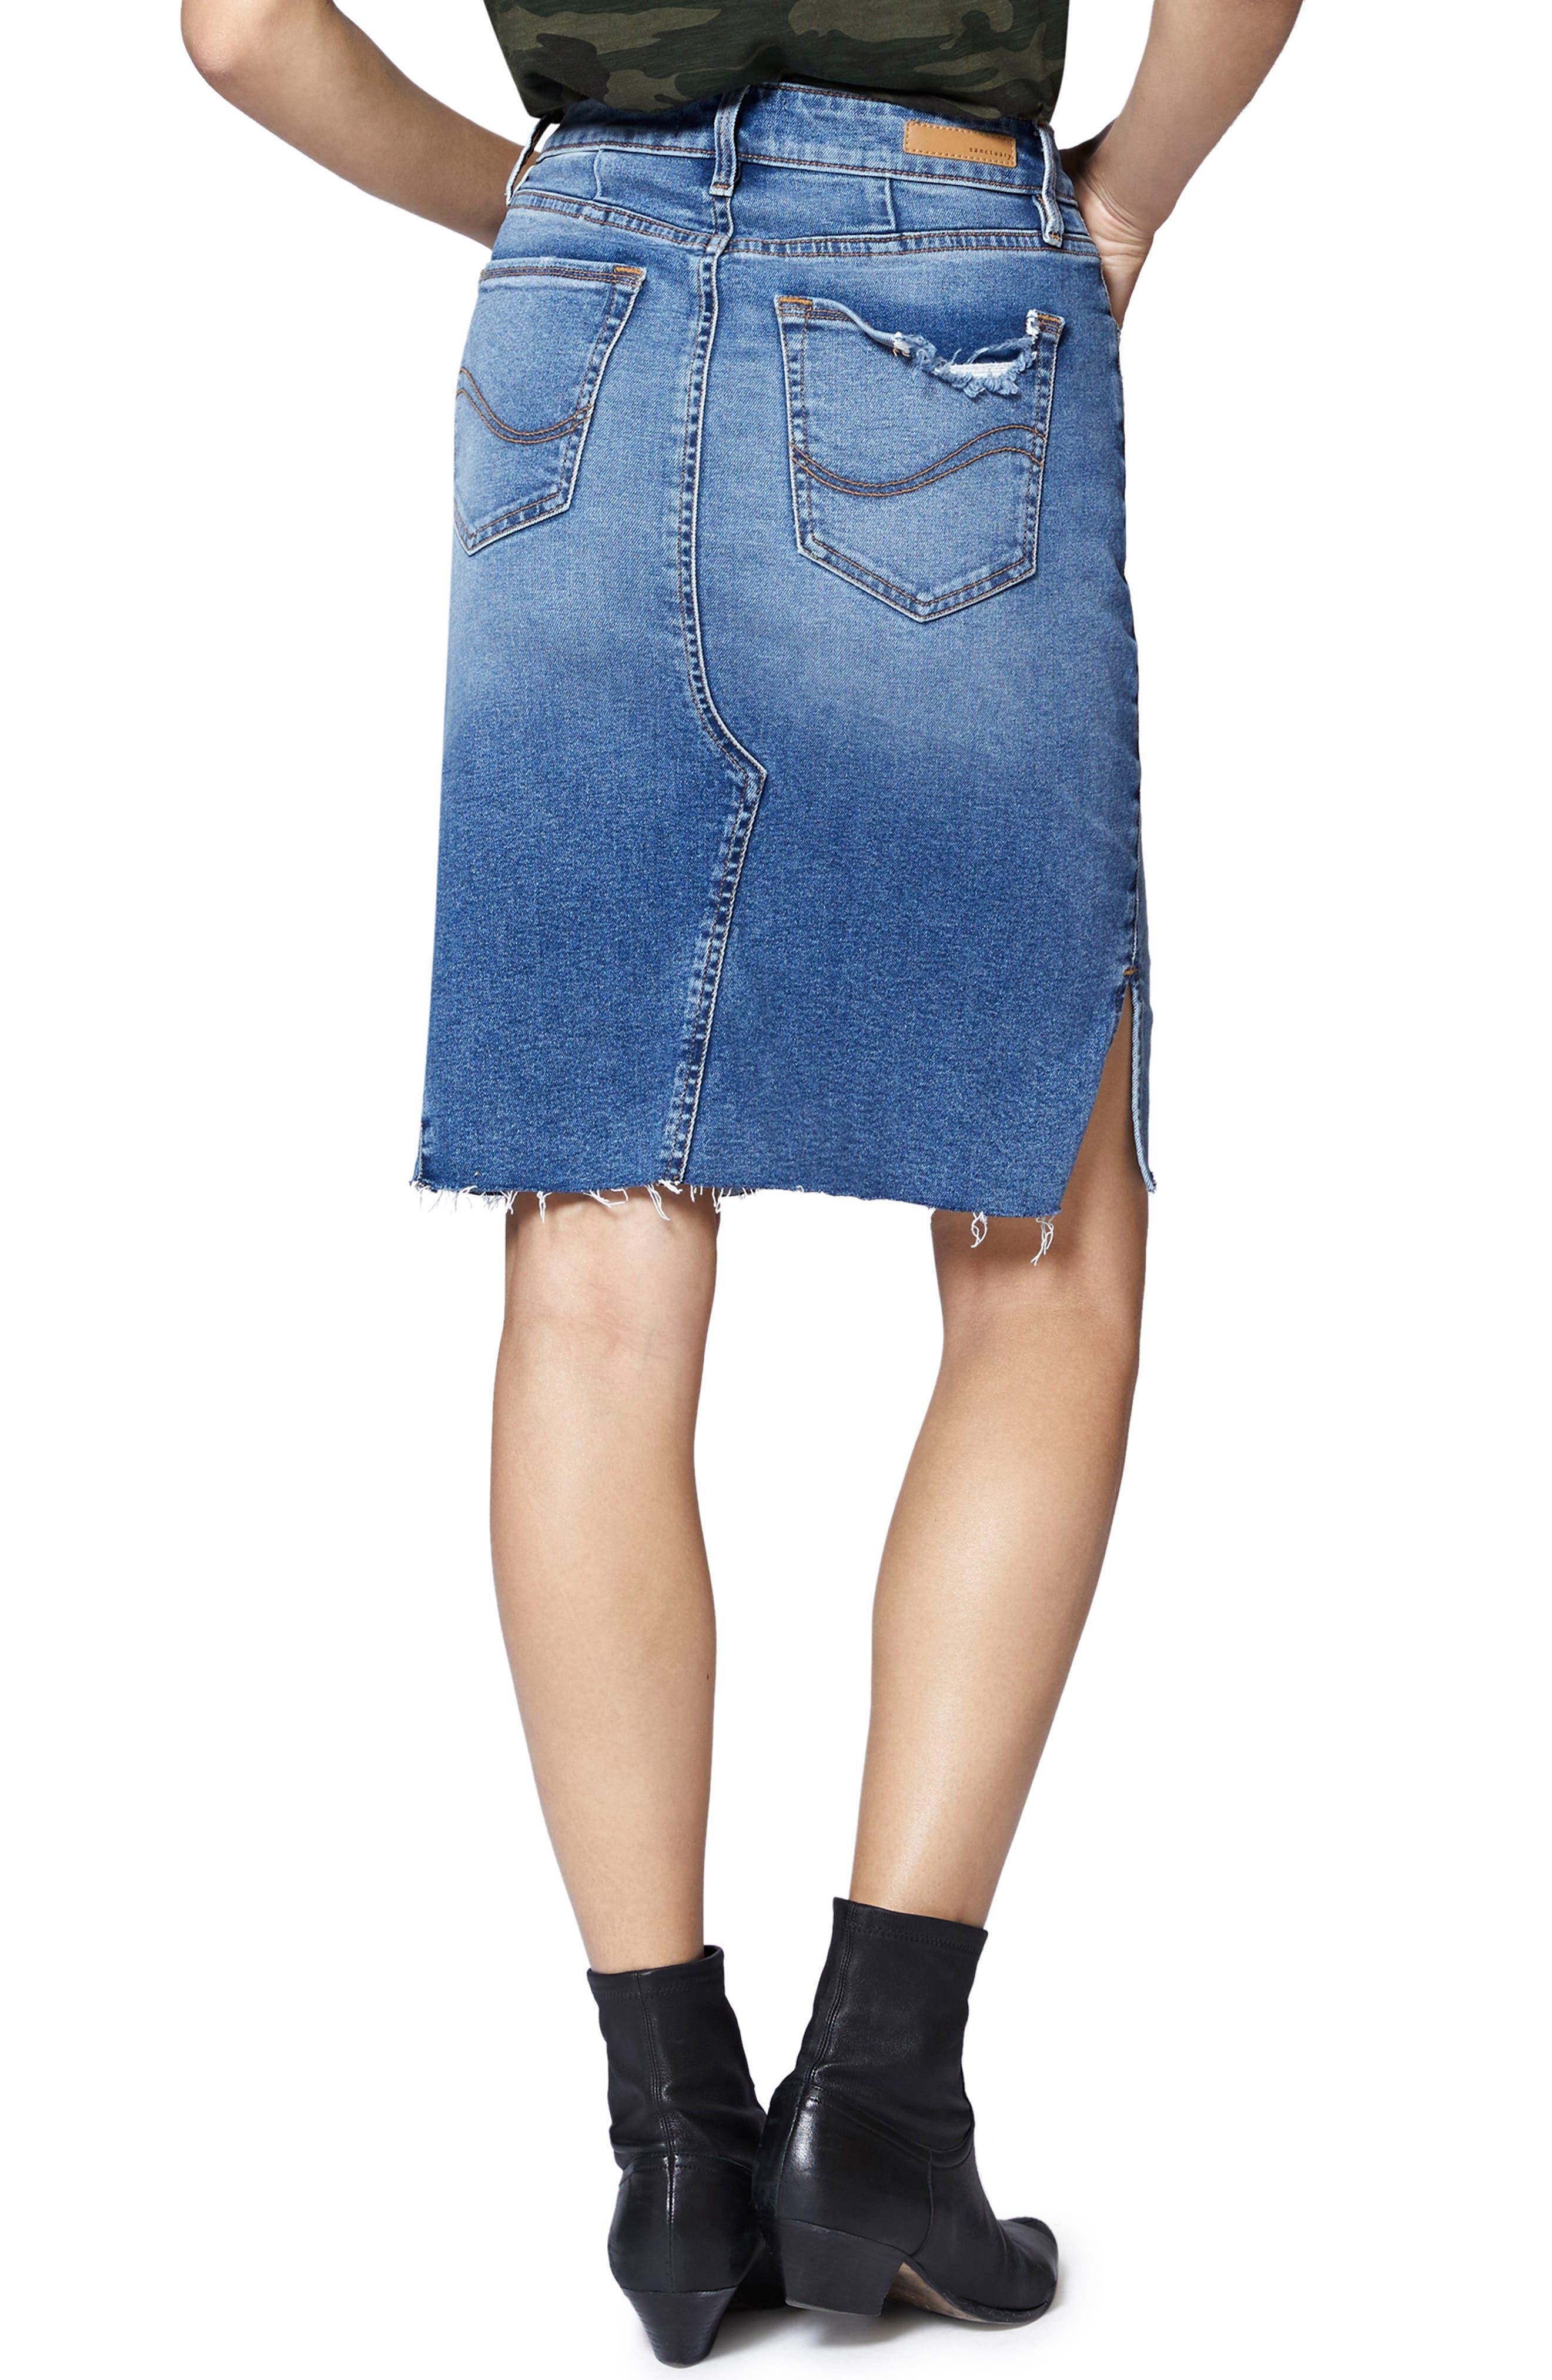 Sia A-Line Denim Skirt,                             Alternate thumbnail 2, color,                             FLAT IRON RIGID